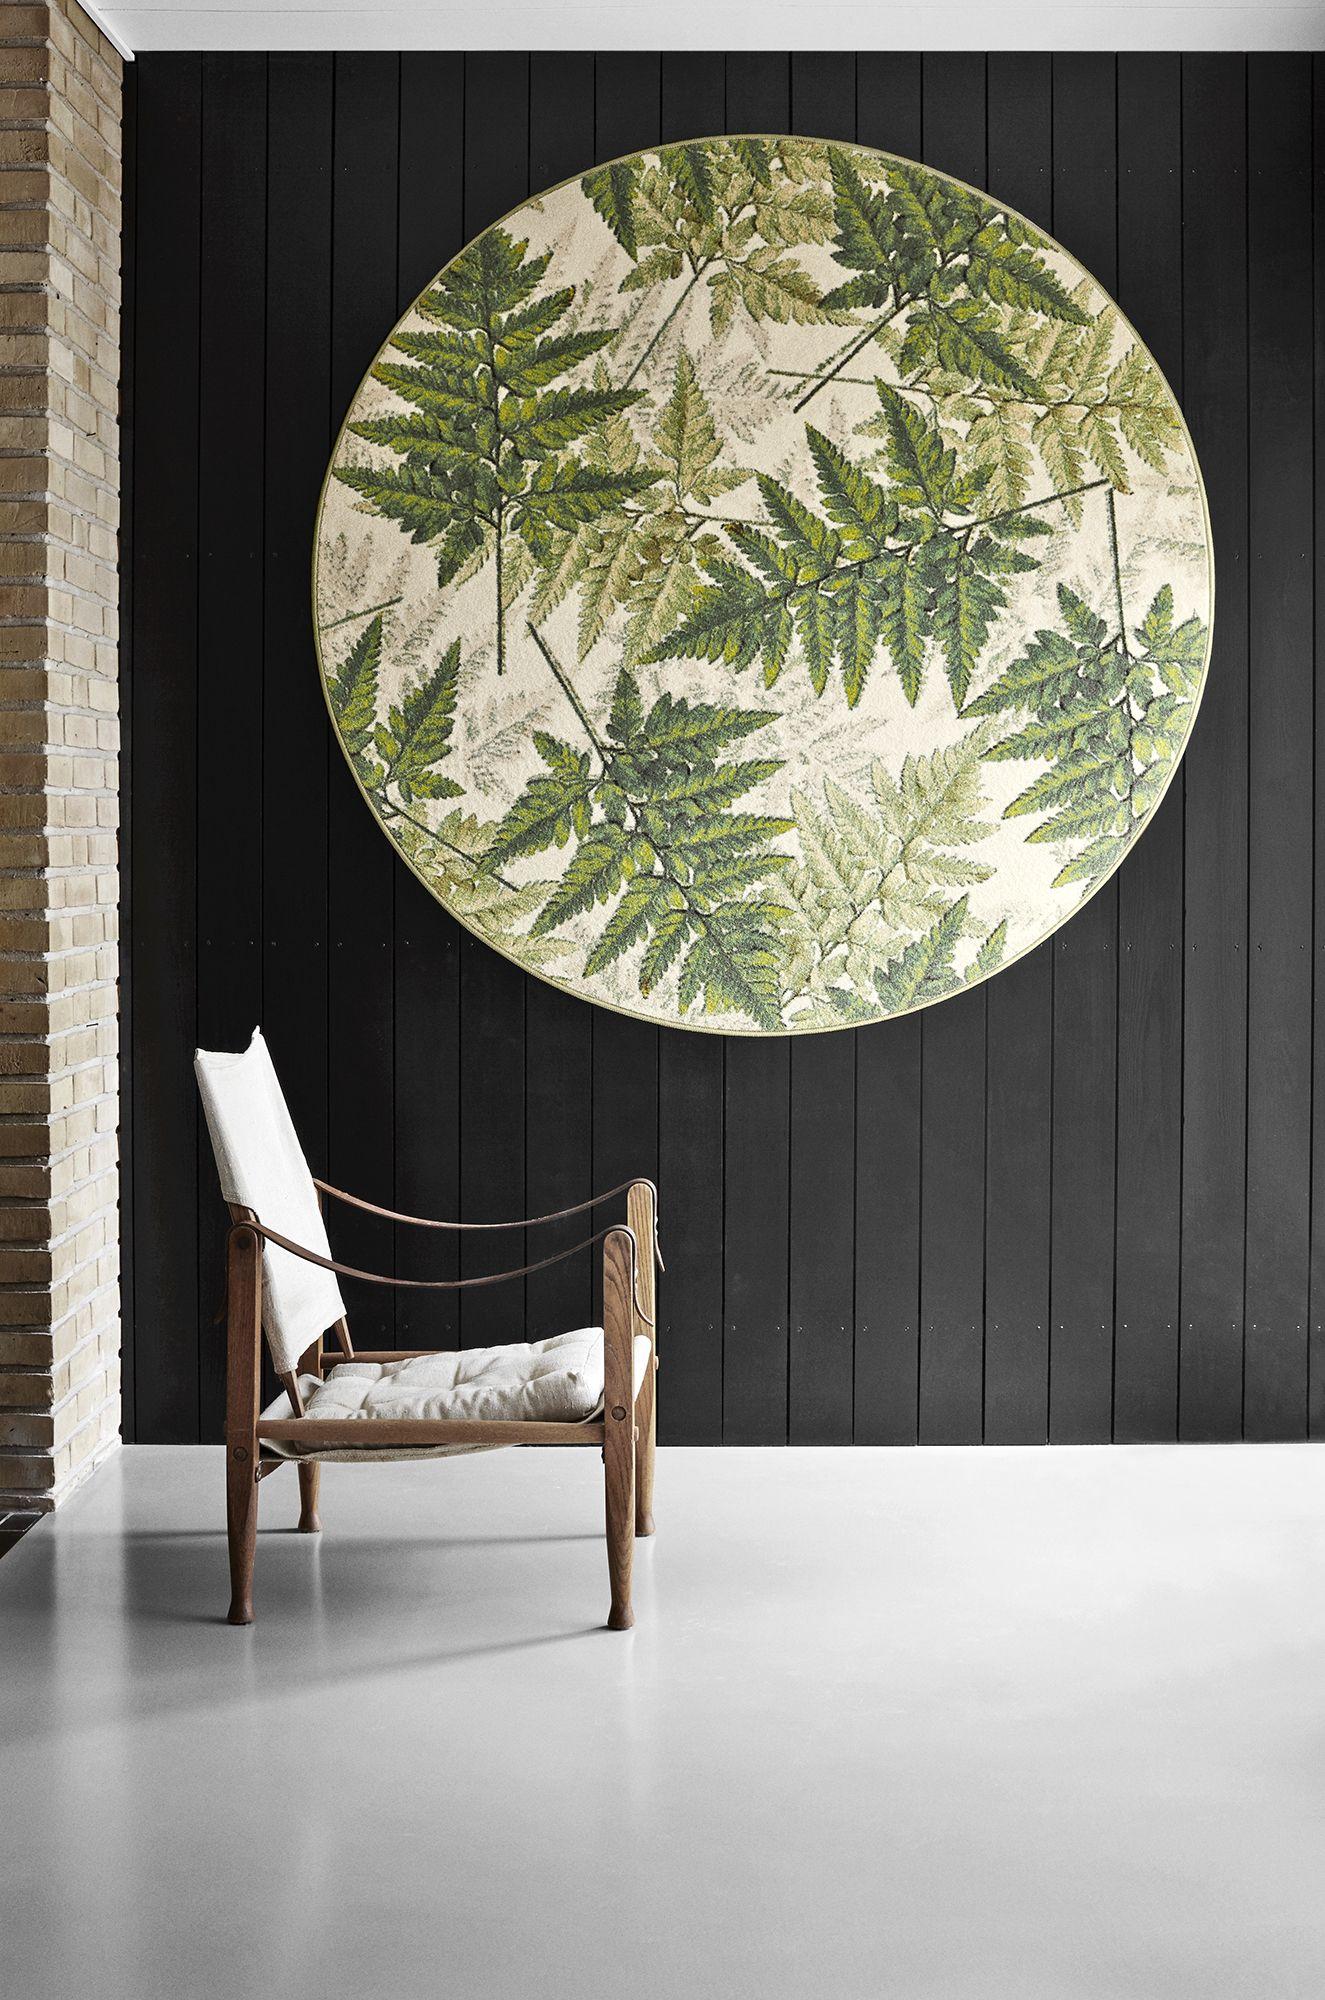 Yellows-Pia-Winther-Ege-Tæpper-Danish-Design-Interior-Home-Decor